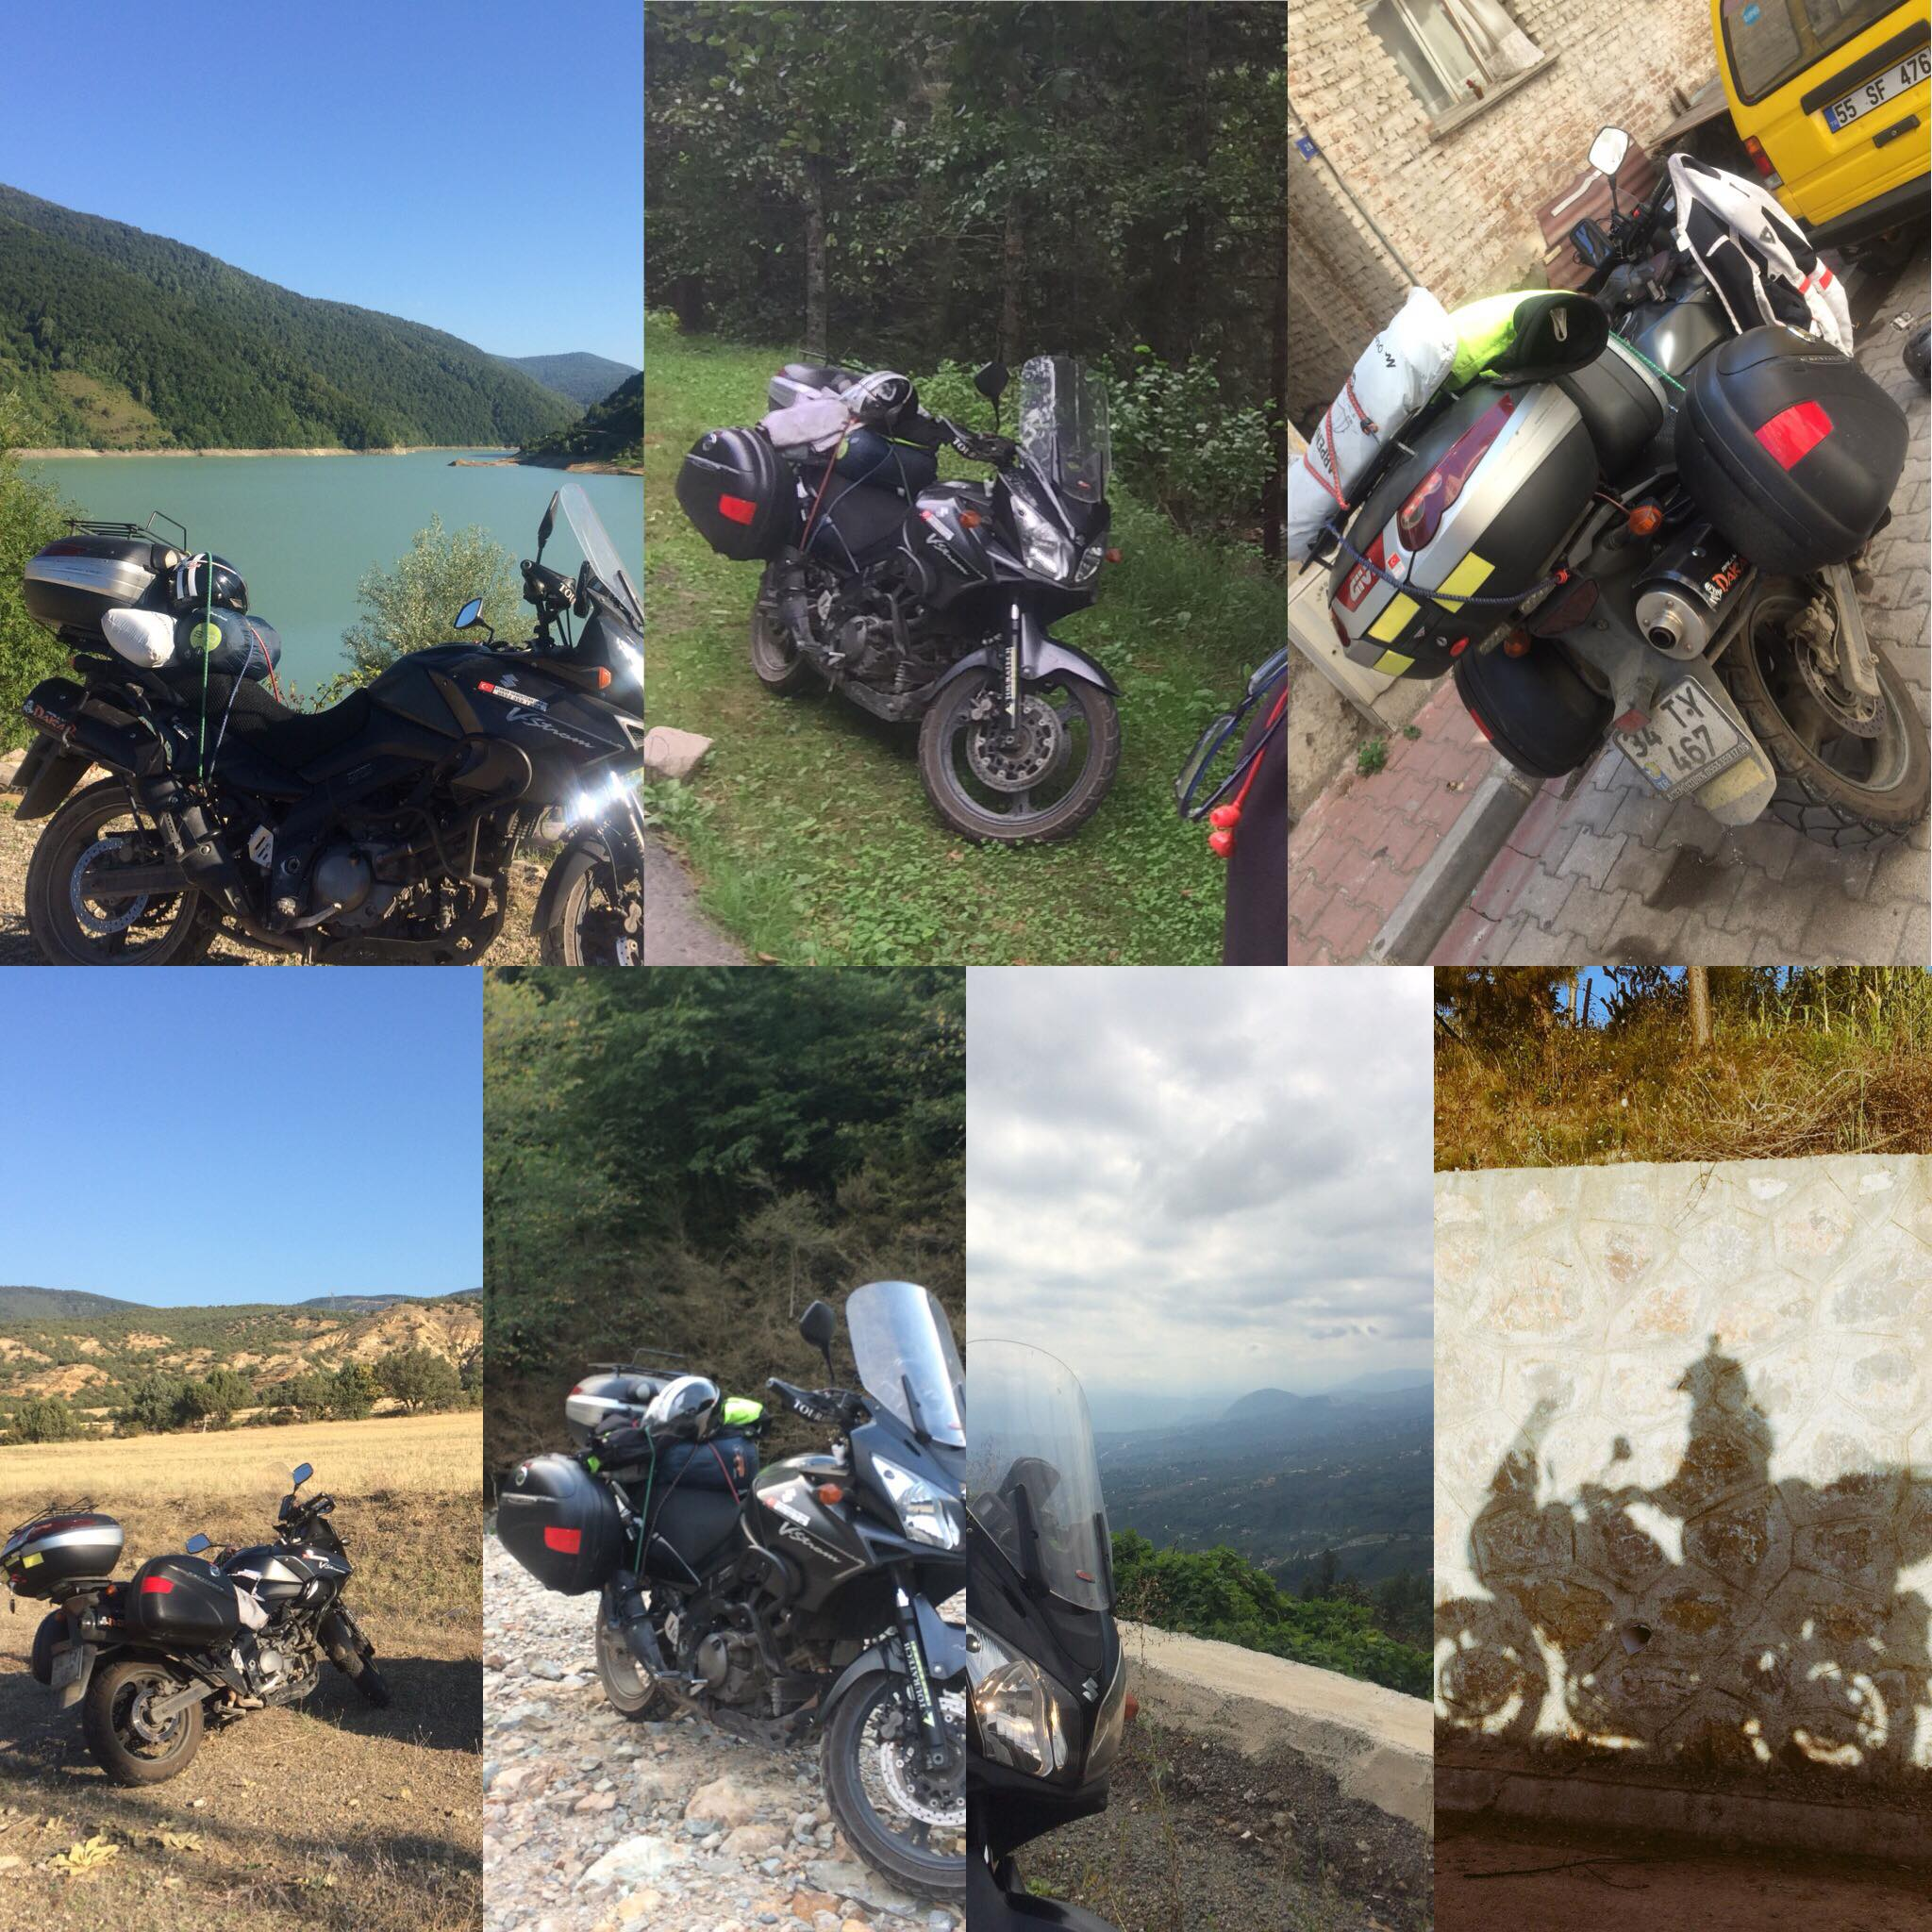 Atakan Demirtürk Suzuki v-strom dl650 Karadeniz gezisi